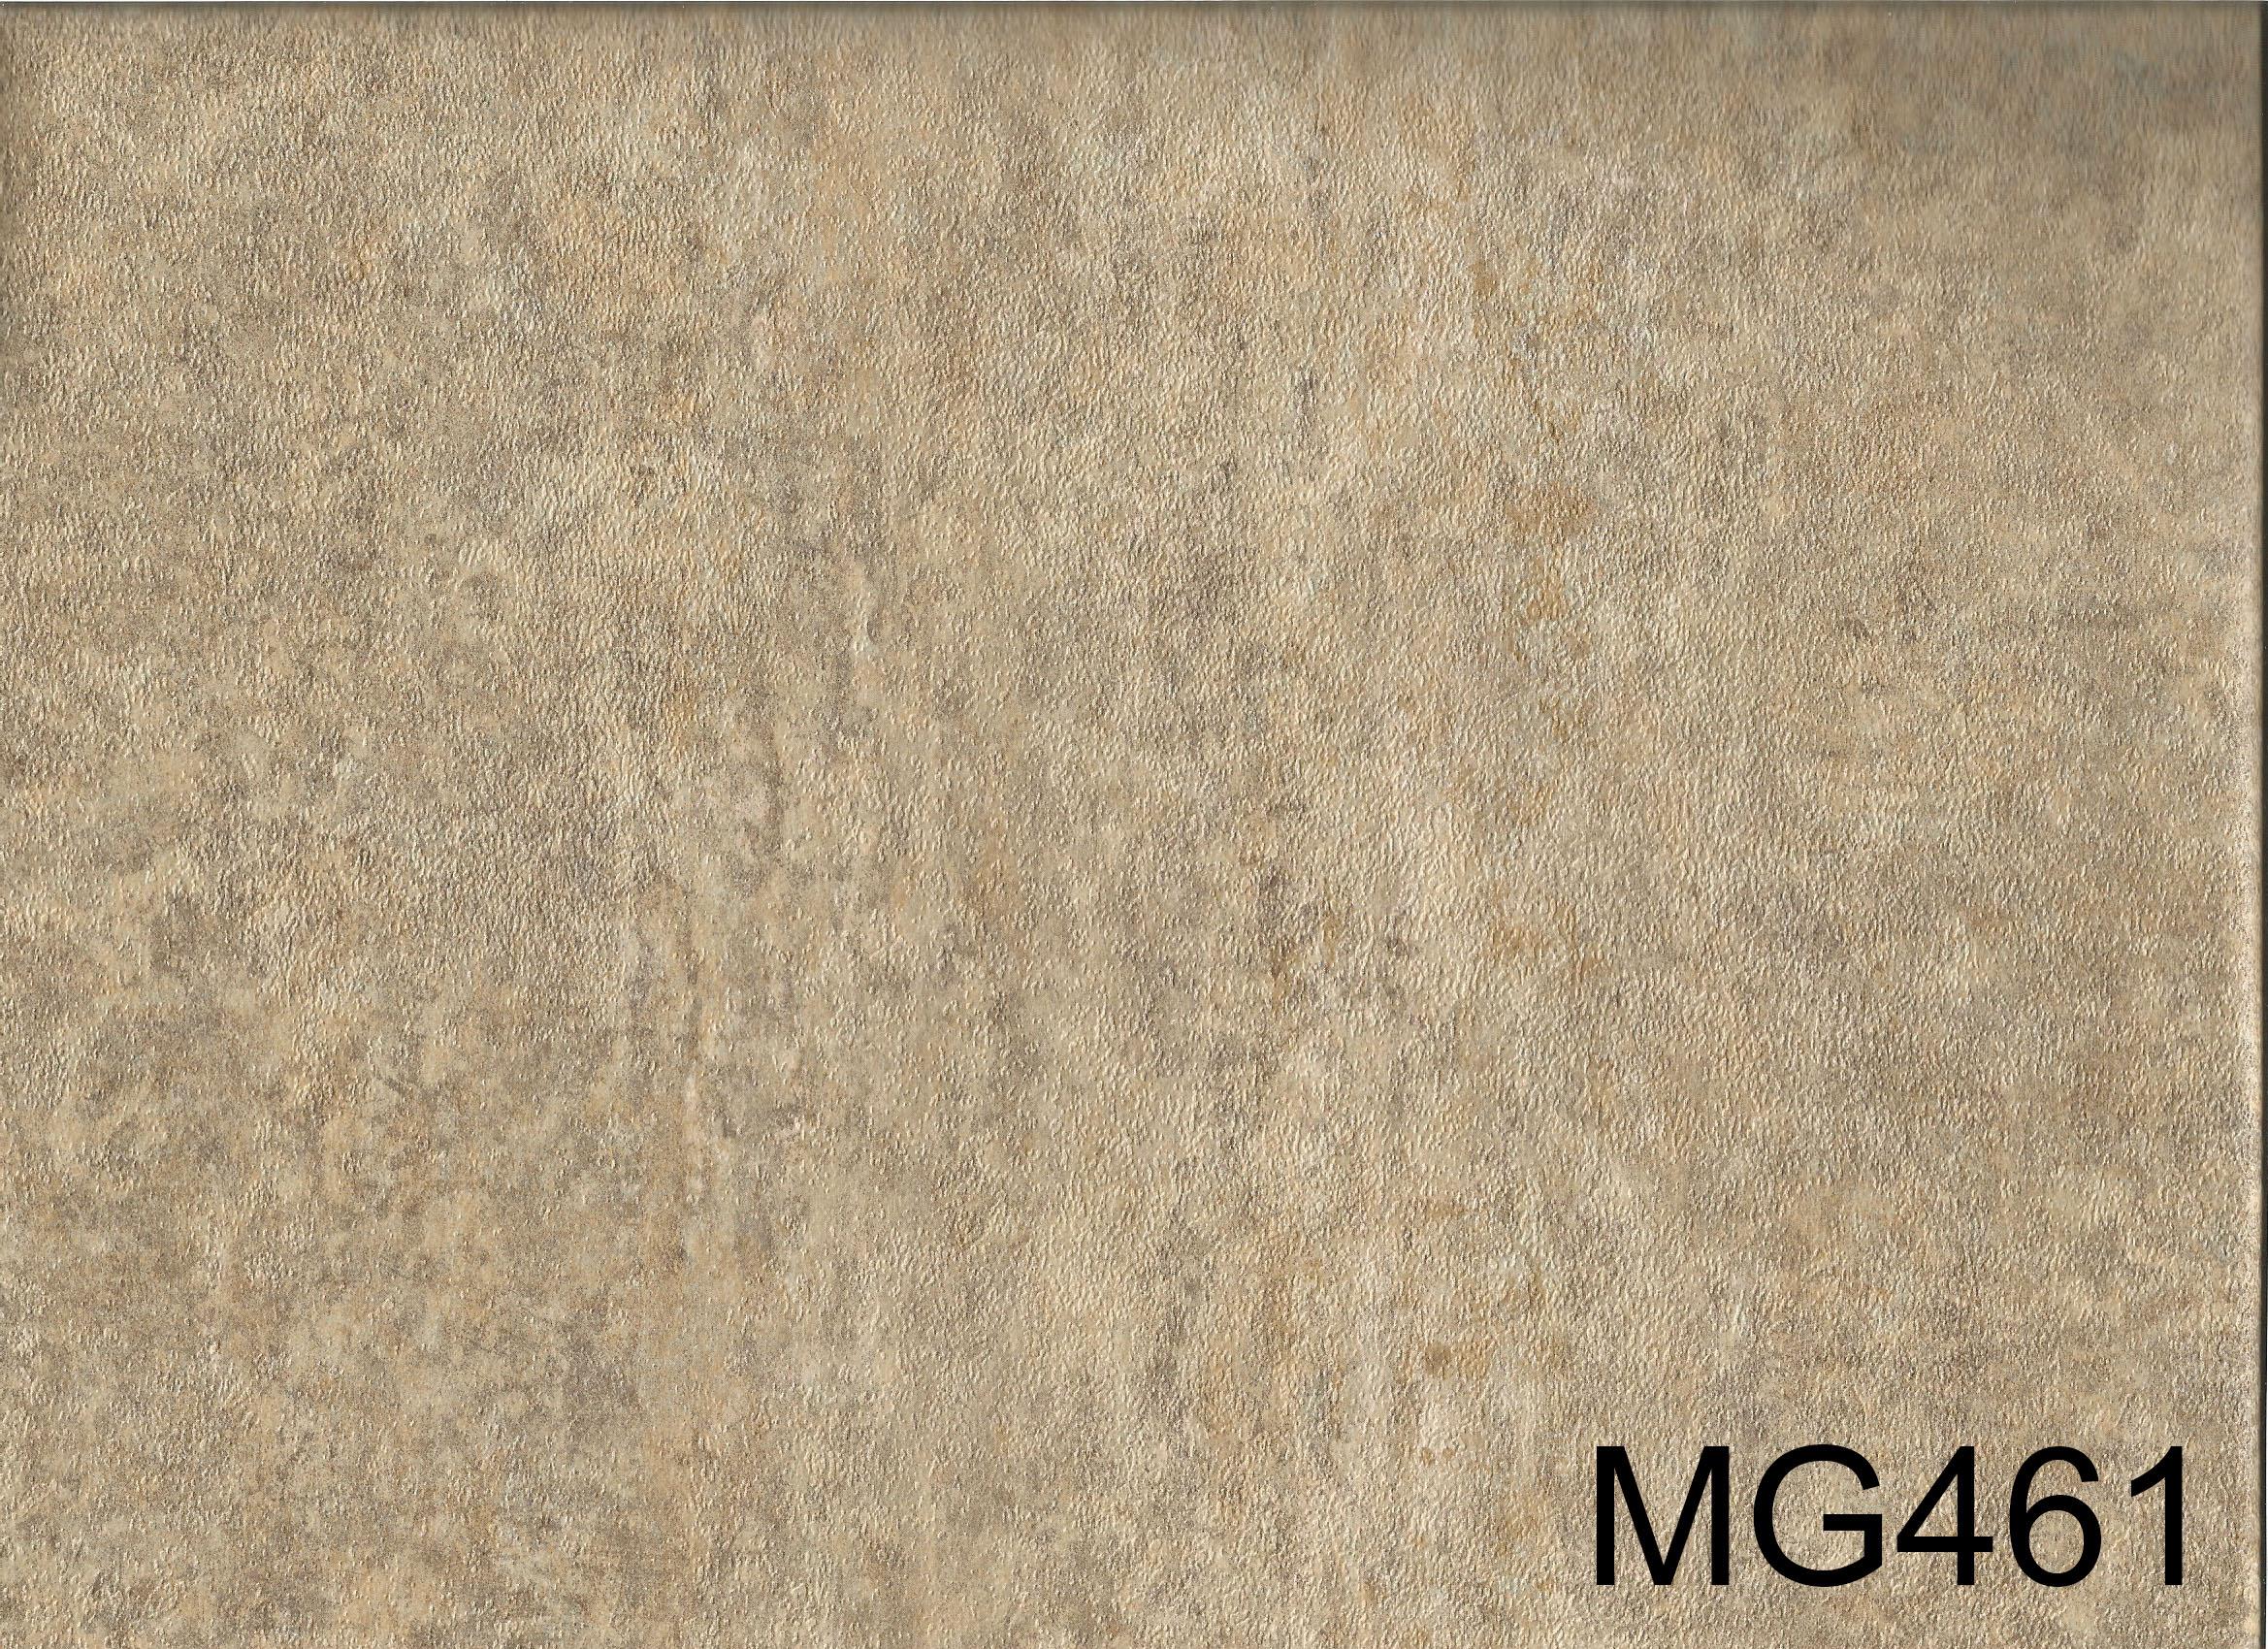 MG461